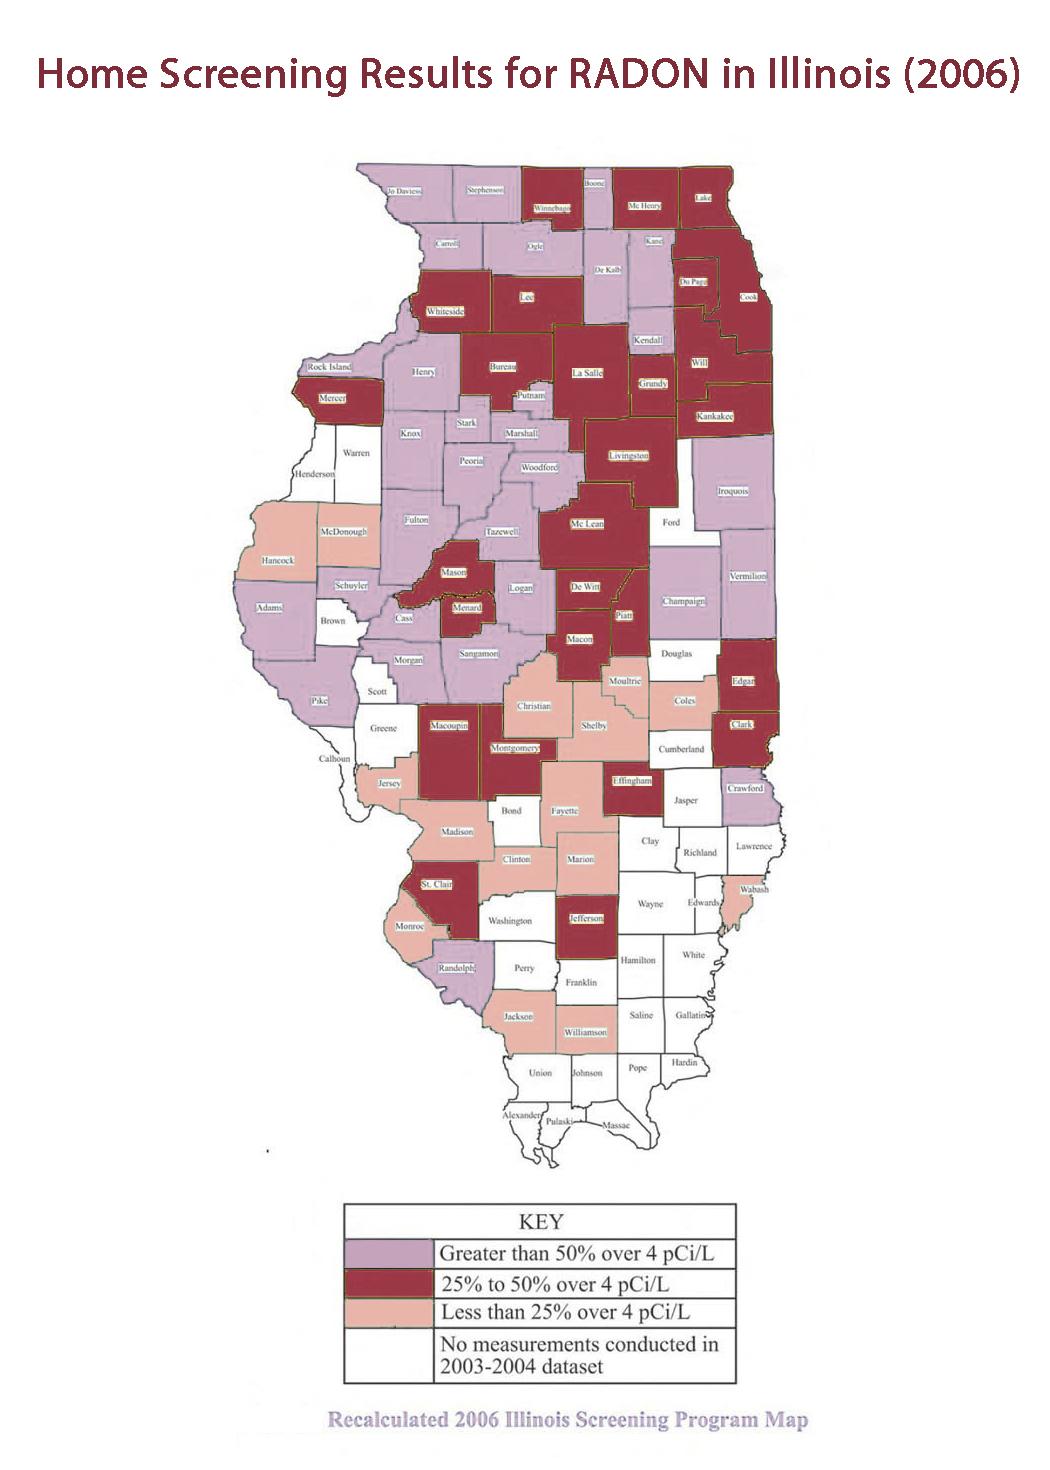 Radon Risks - ge Radon Testing, Inc. on illinois gold map, illinois selenium map, illinois energy map, illinois mine subsidence map, illinois wetlands map, illinois science map, illinois co map, illinois water map, illinois air quality map, illinois pollution map, illinois well map, illinois soil map,